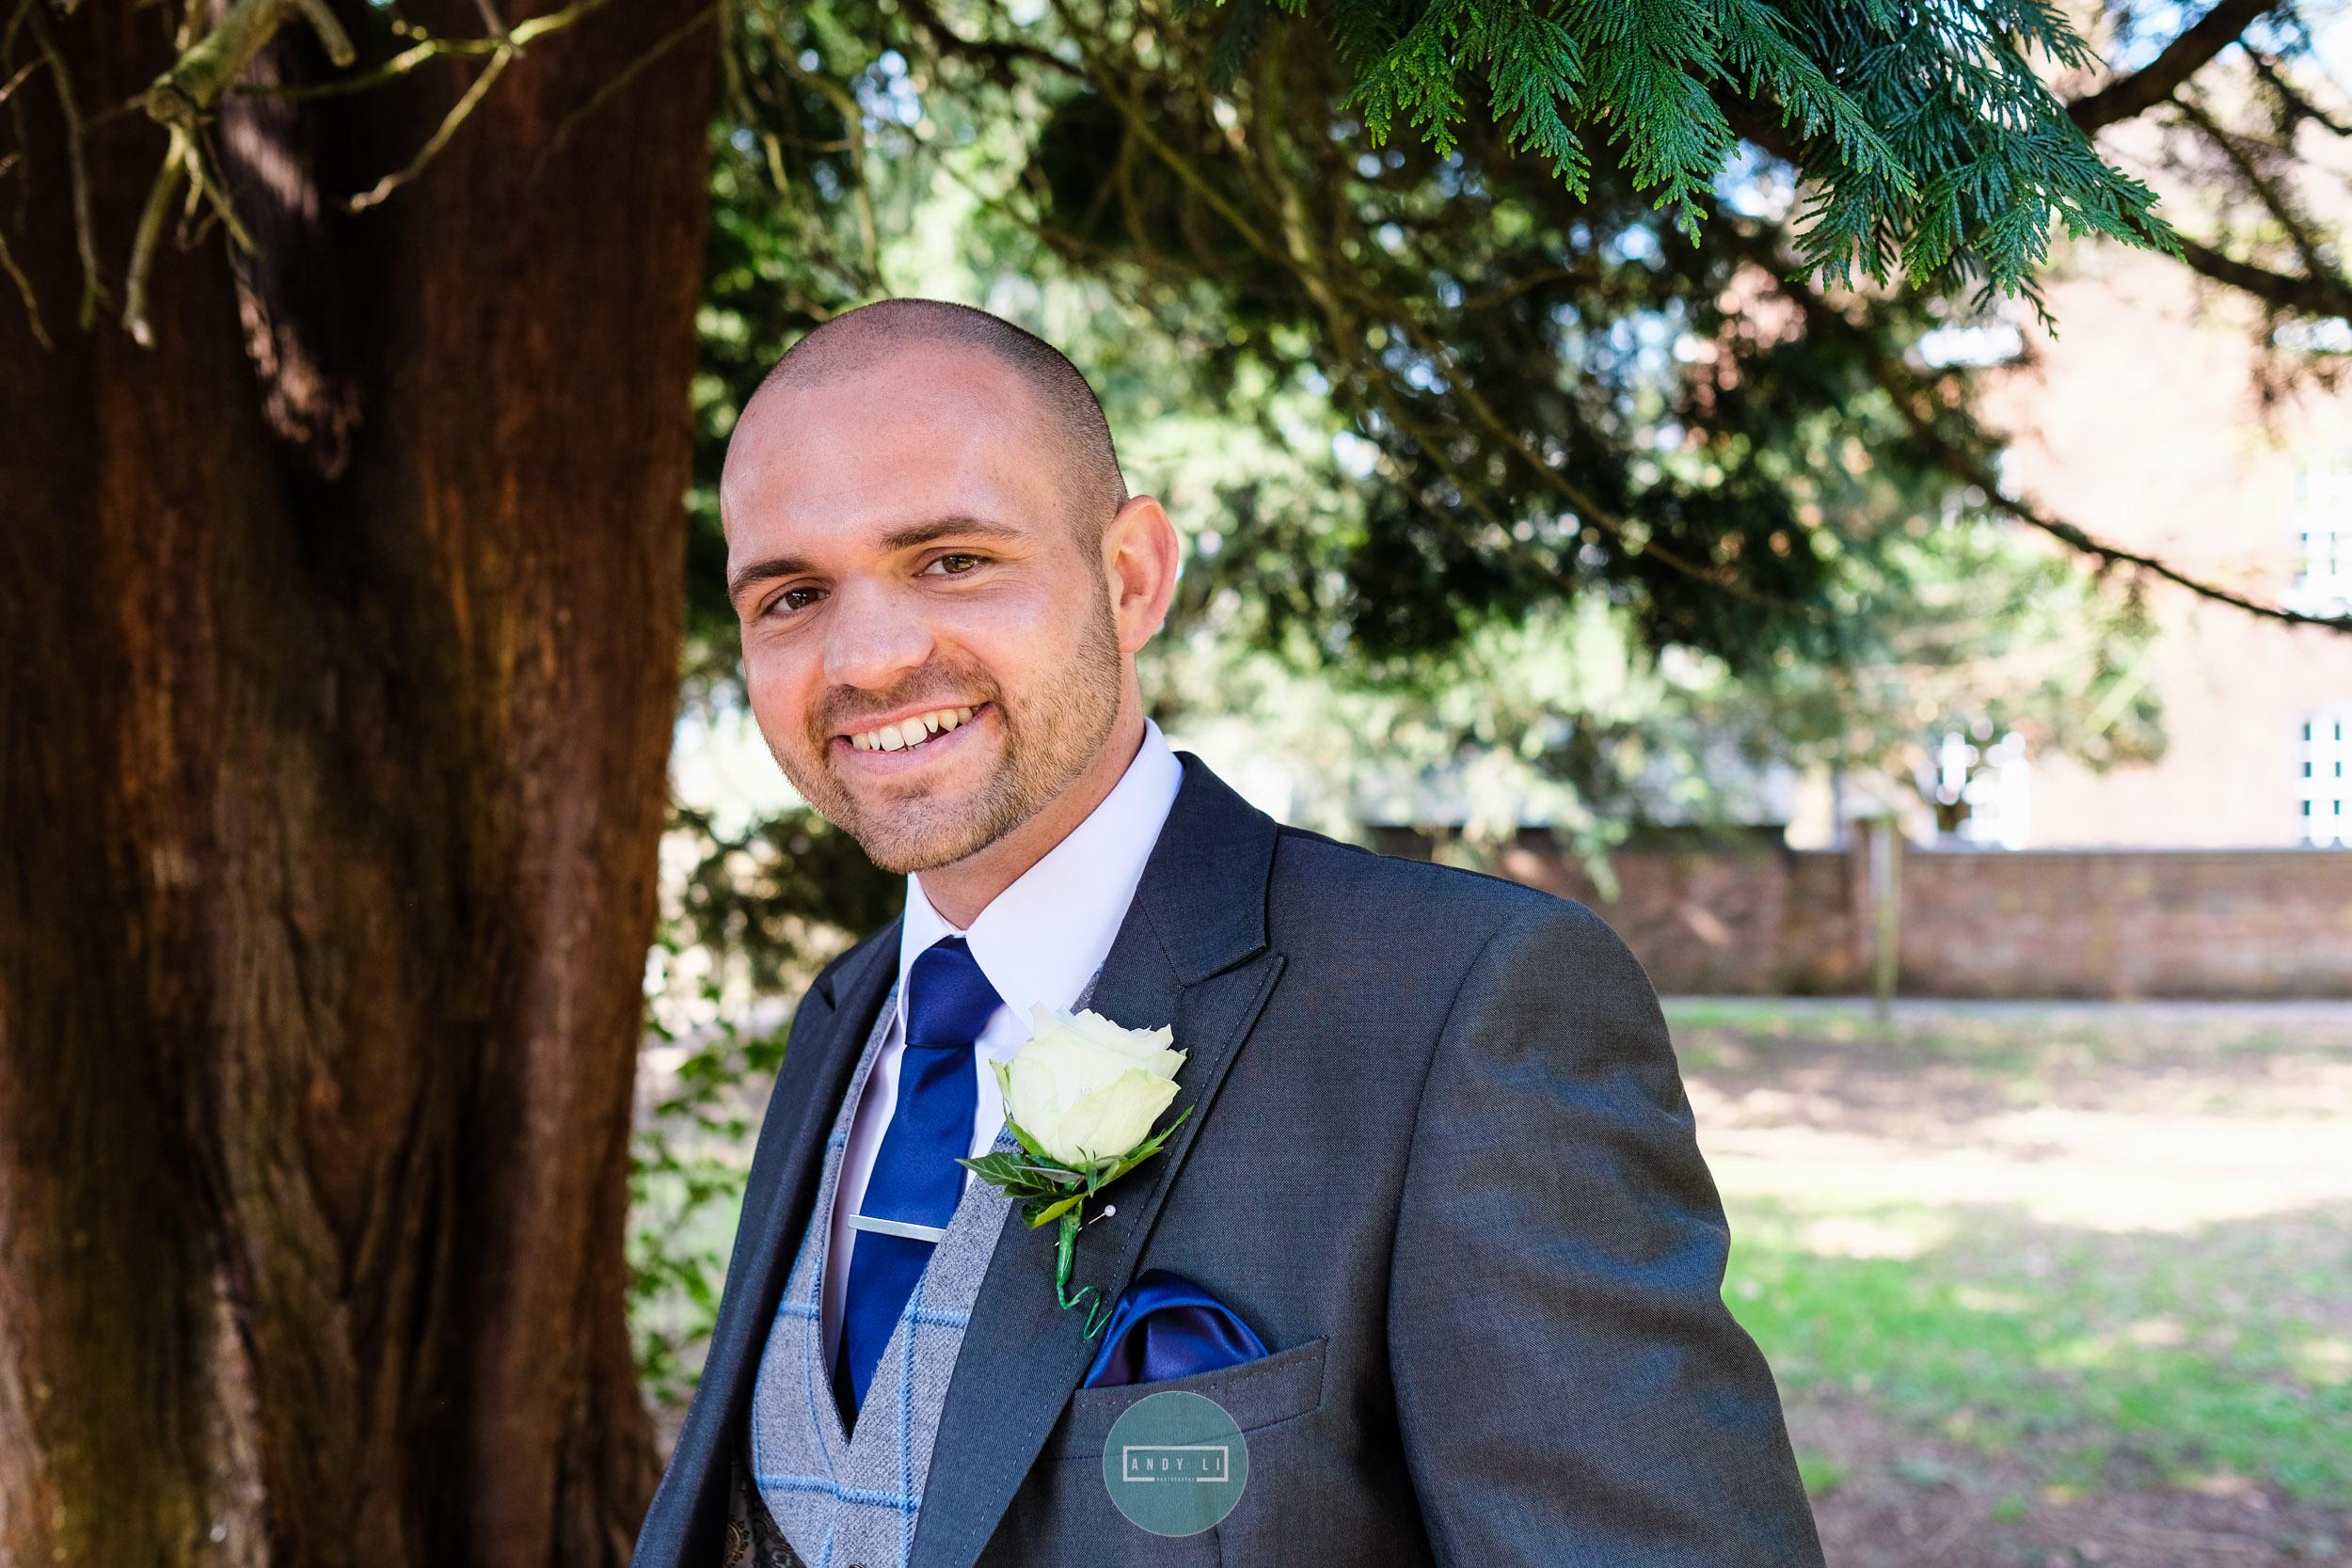 Lilleshall Hall Wedding Photographer-015-AXT21373.jpg